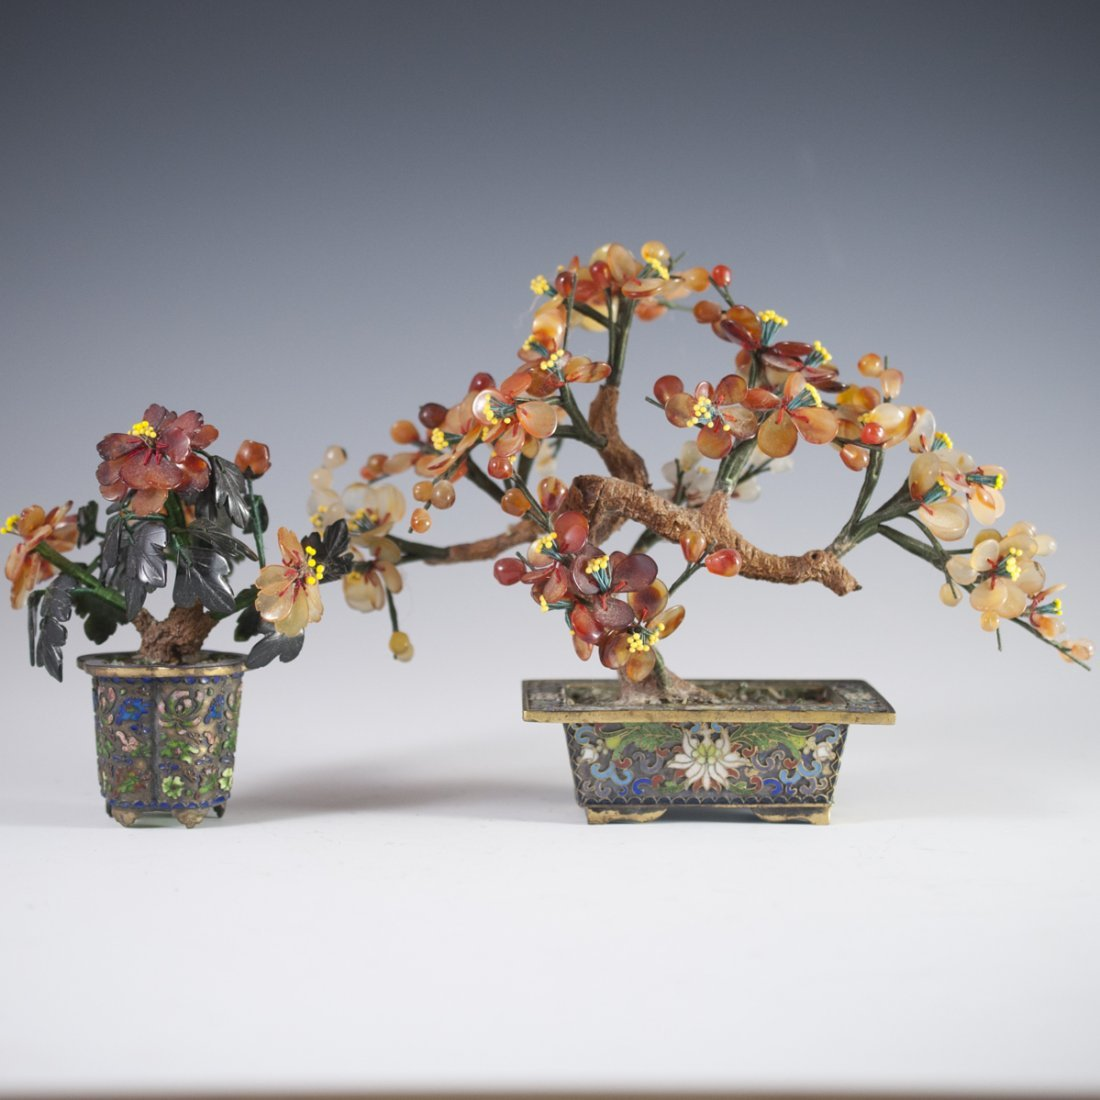 Chinese Enameled Cloissone Agate Bonsai Trees